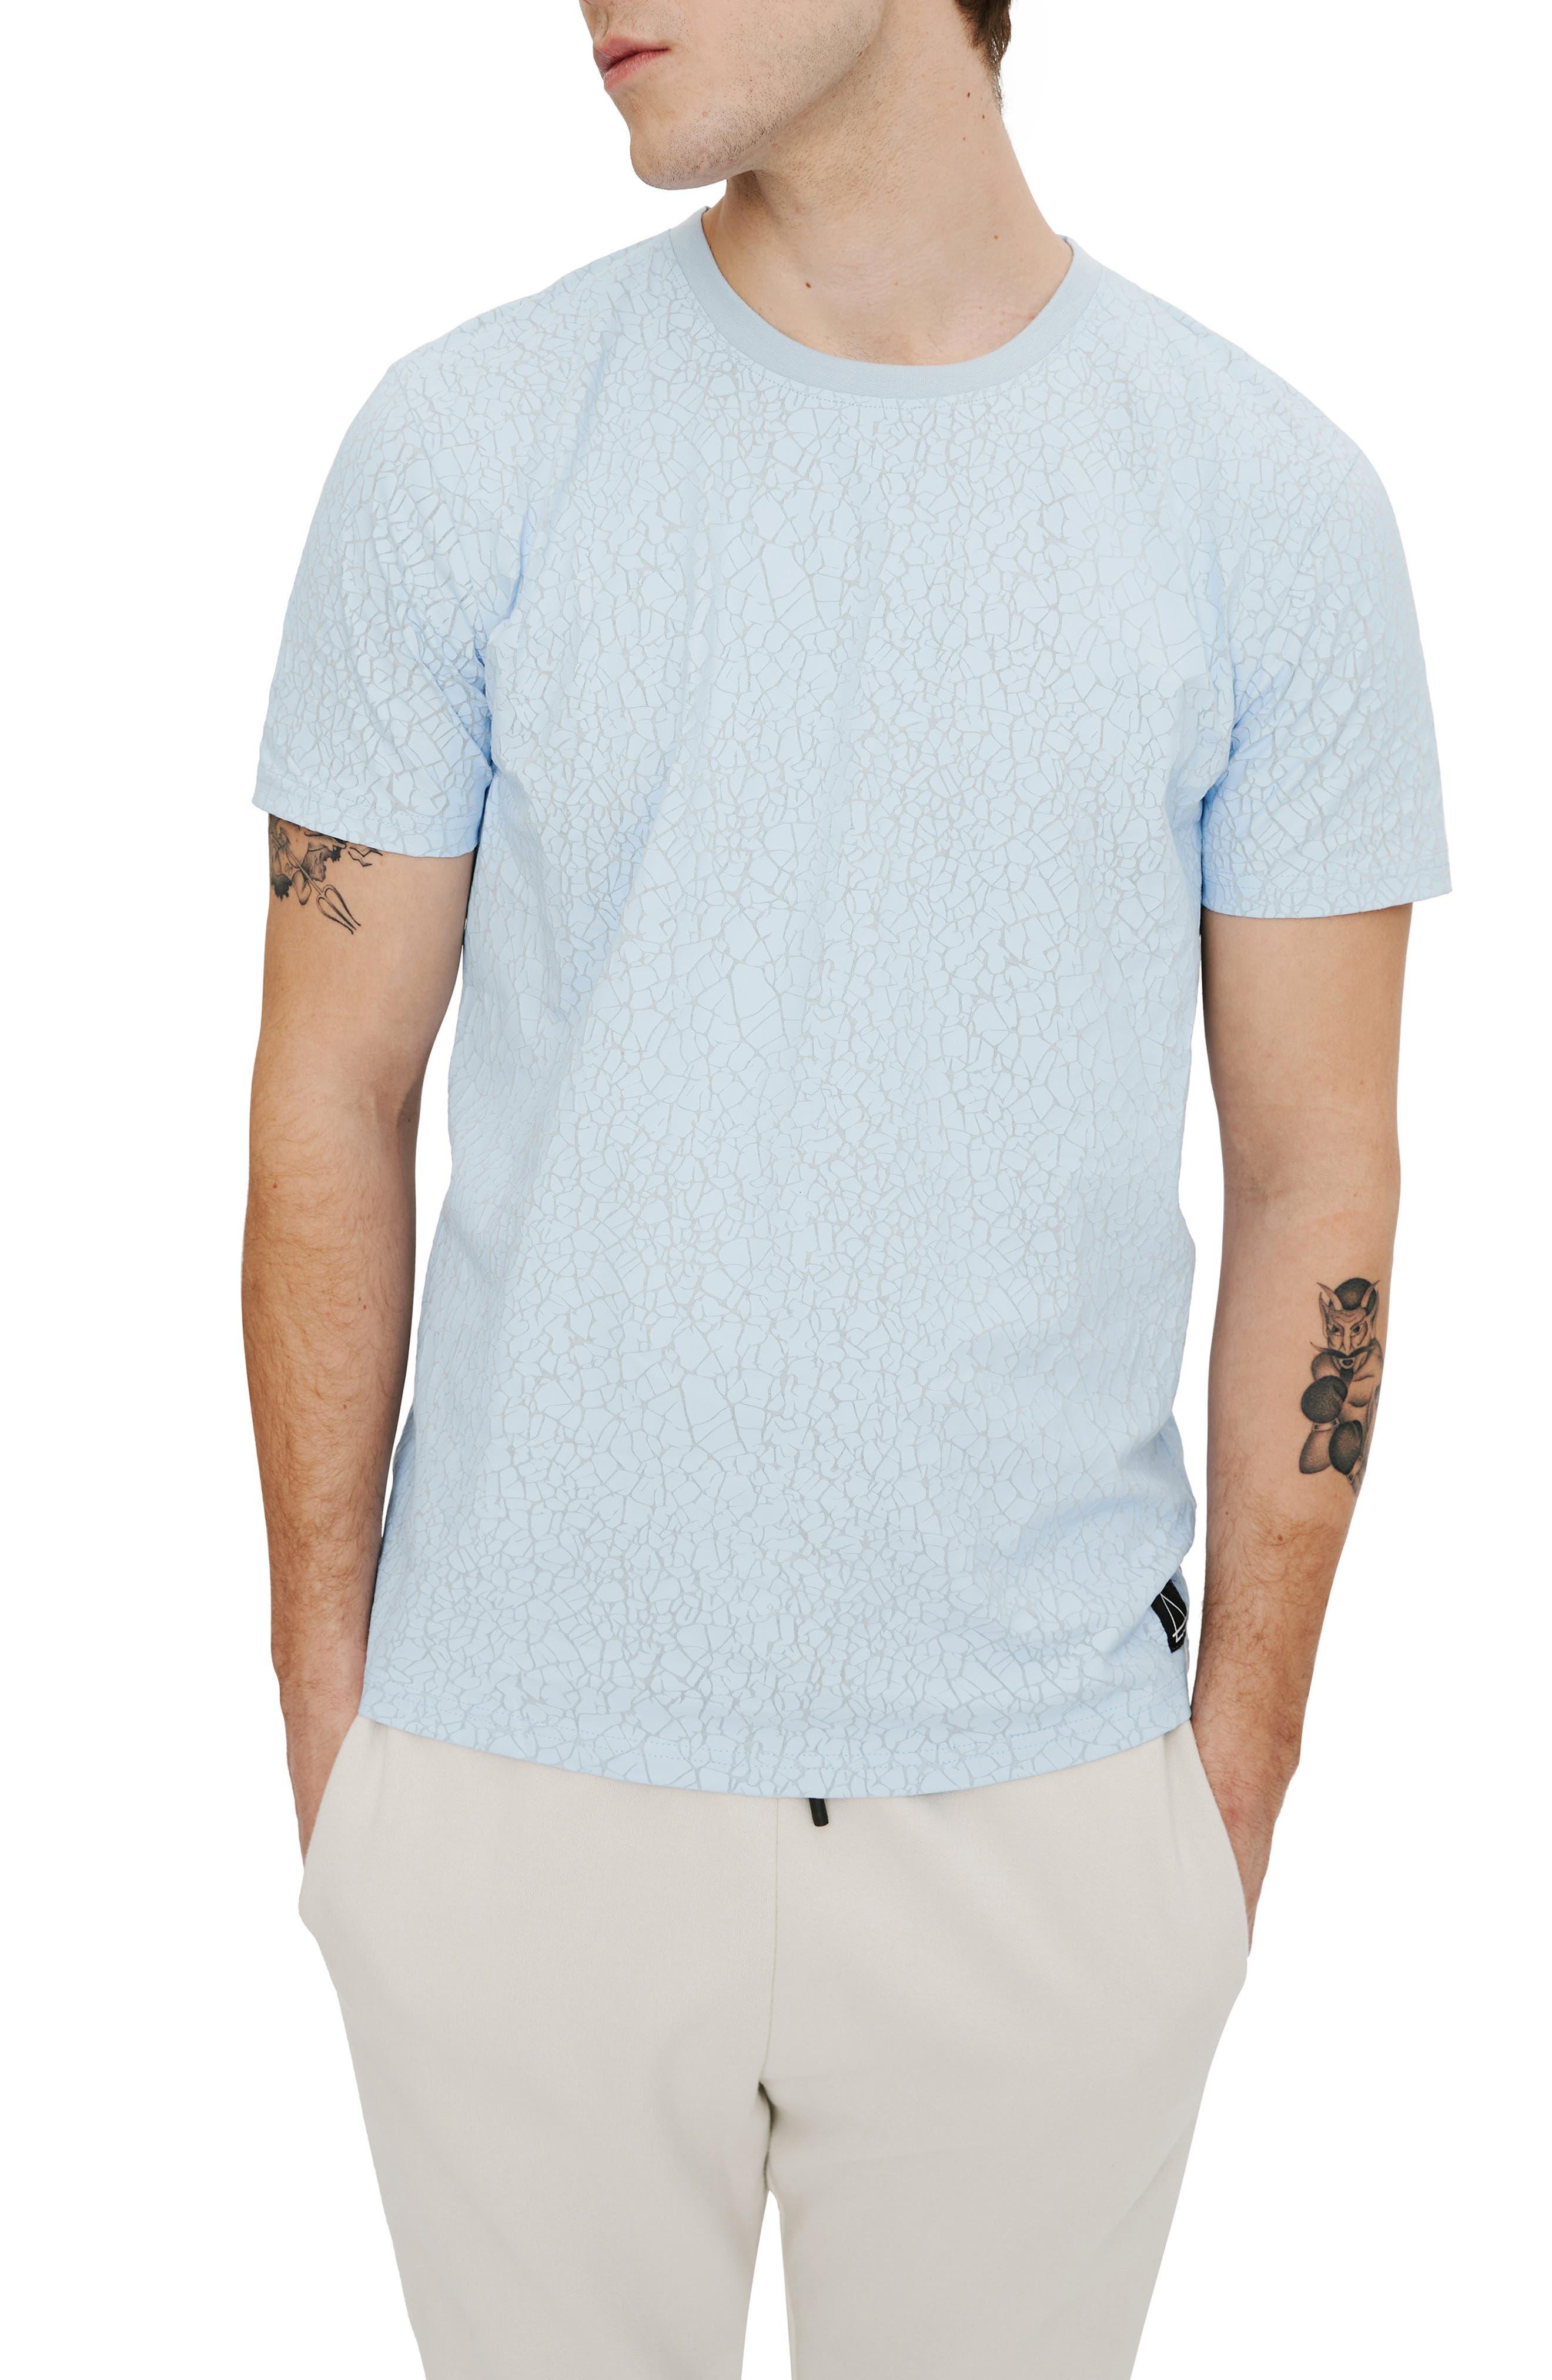 Crackle T-Shirt